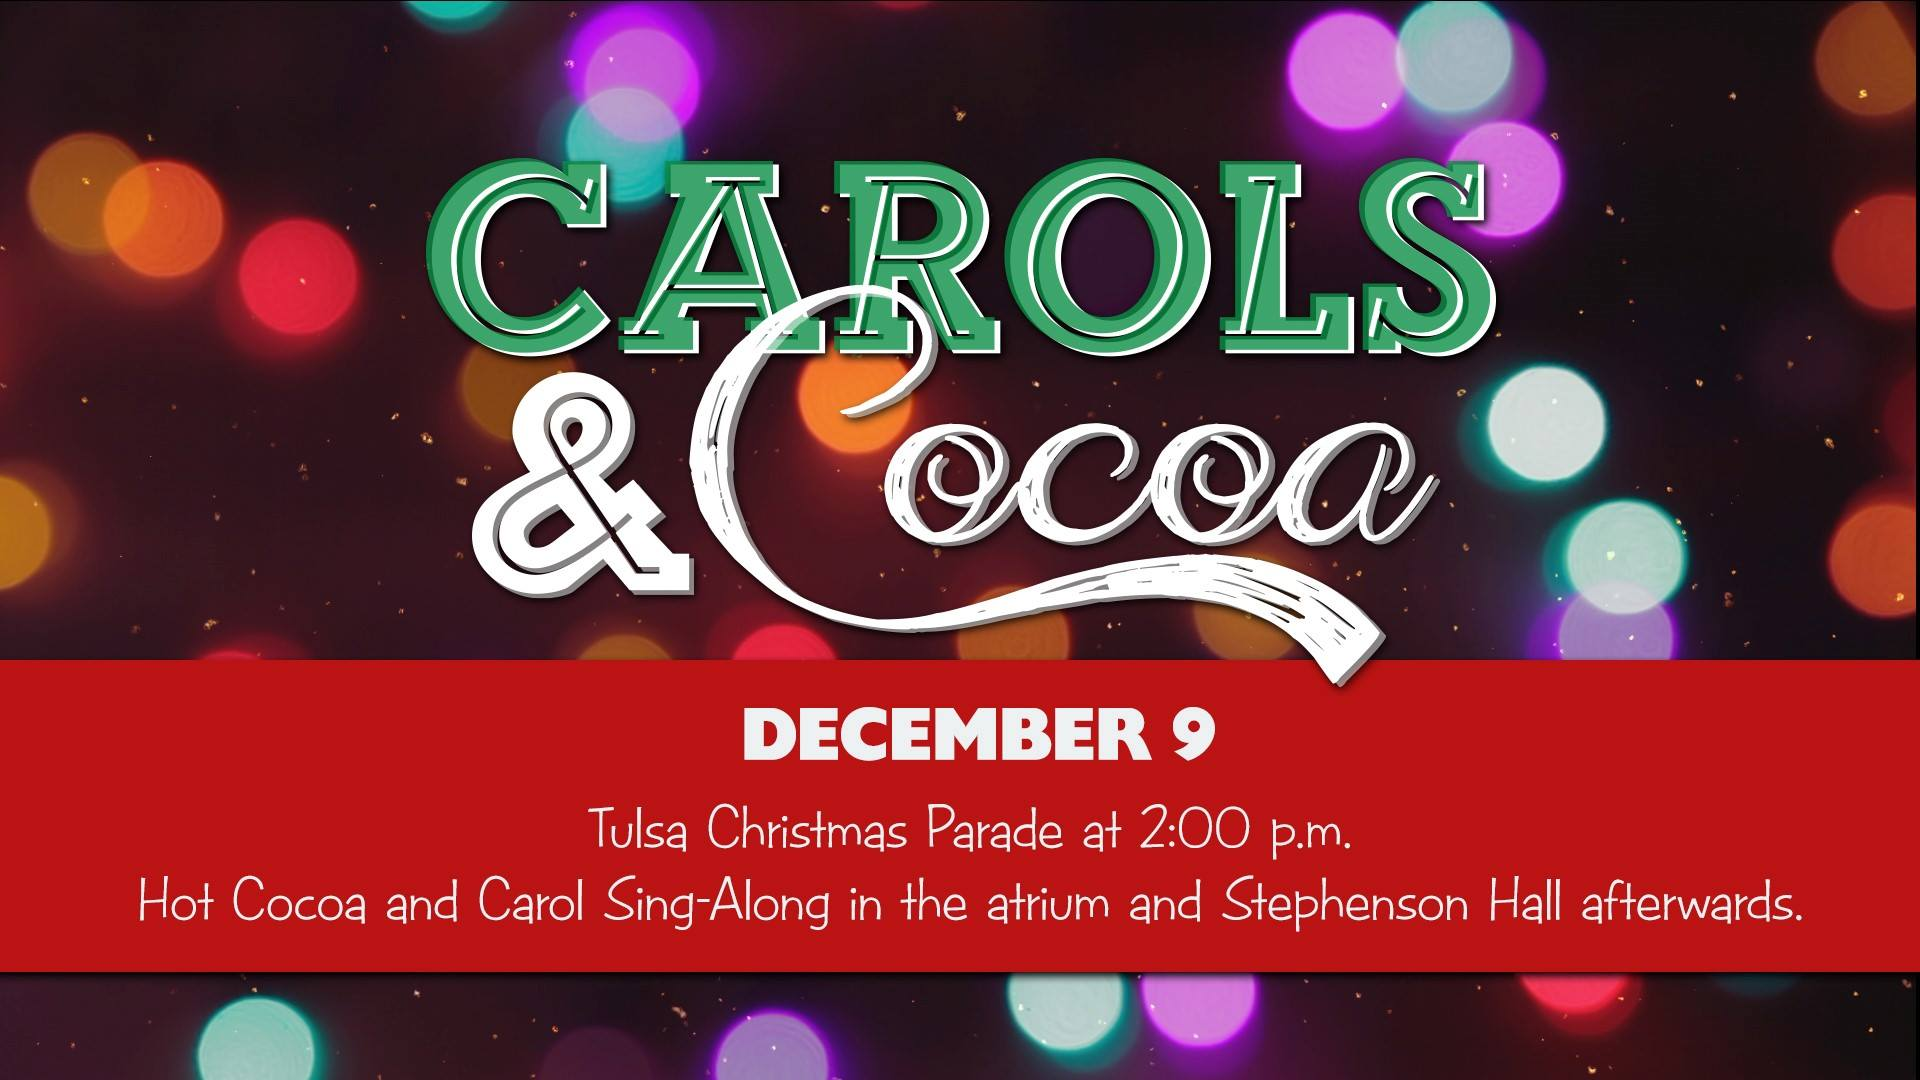 carols cocoa tulsa christmas parade